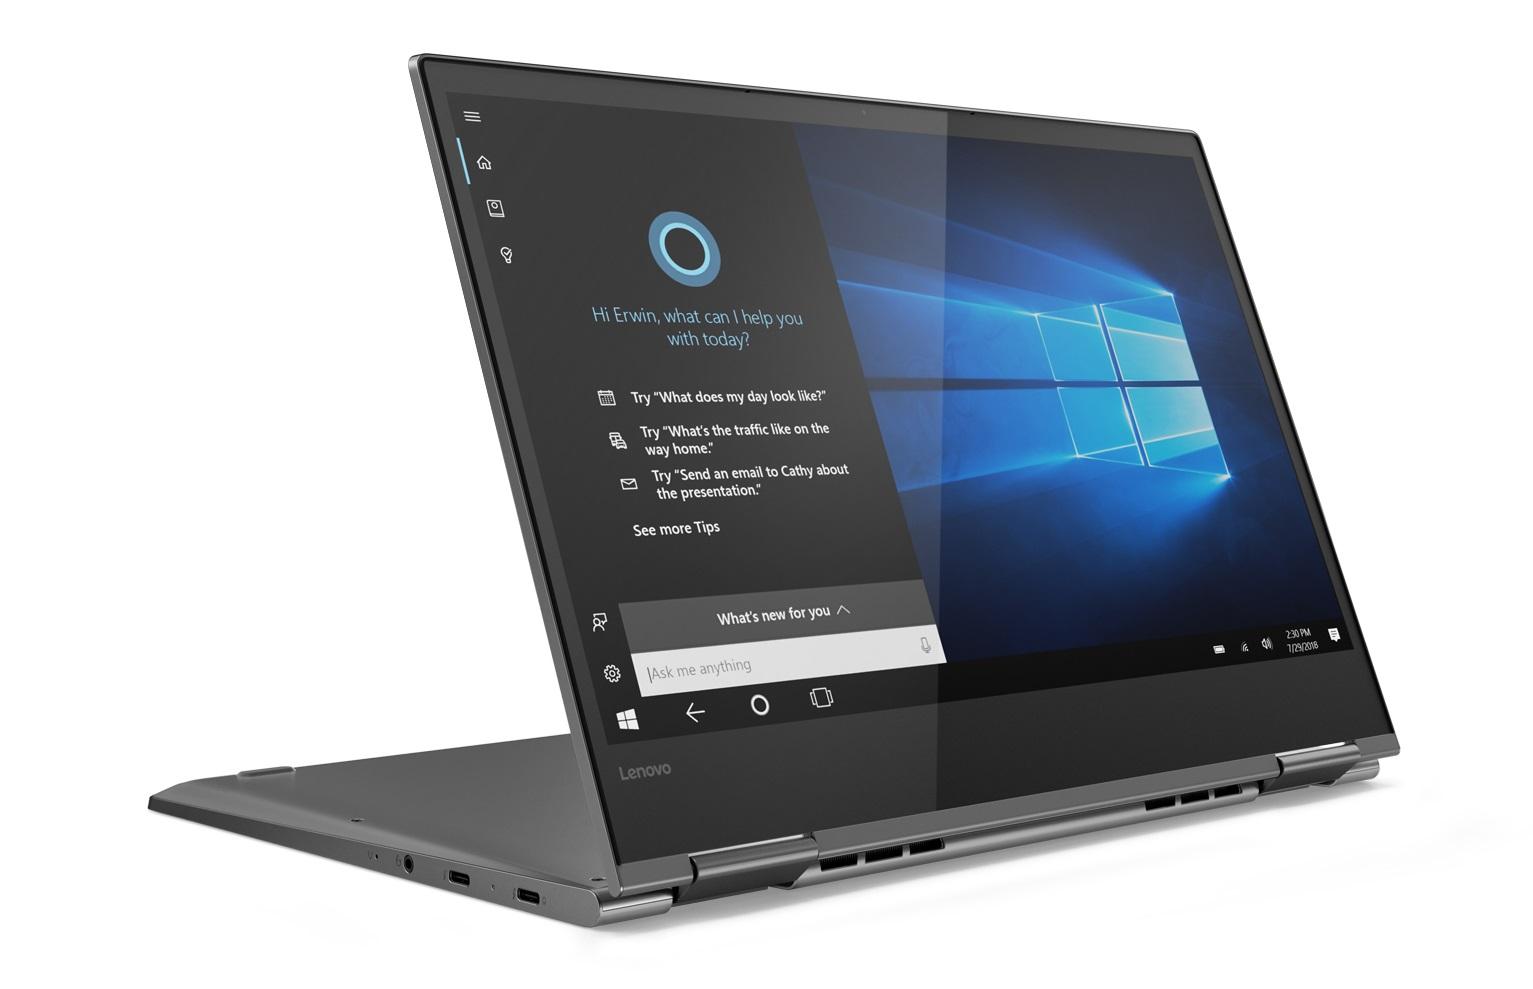 Фото  Ультрабук Lenovo Yoga 730 Iron Grey (81CT008PRA)